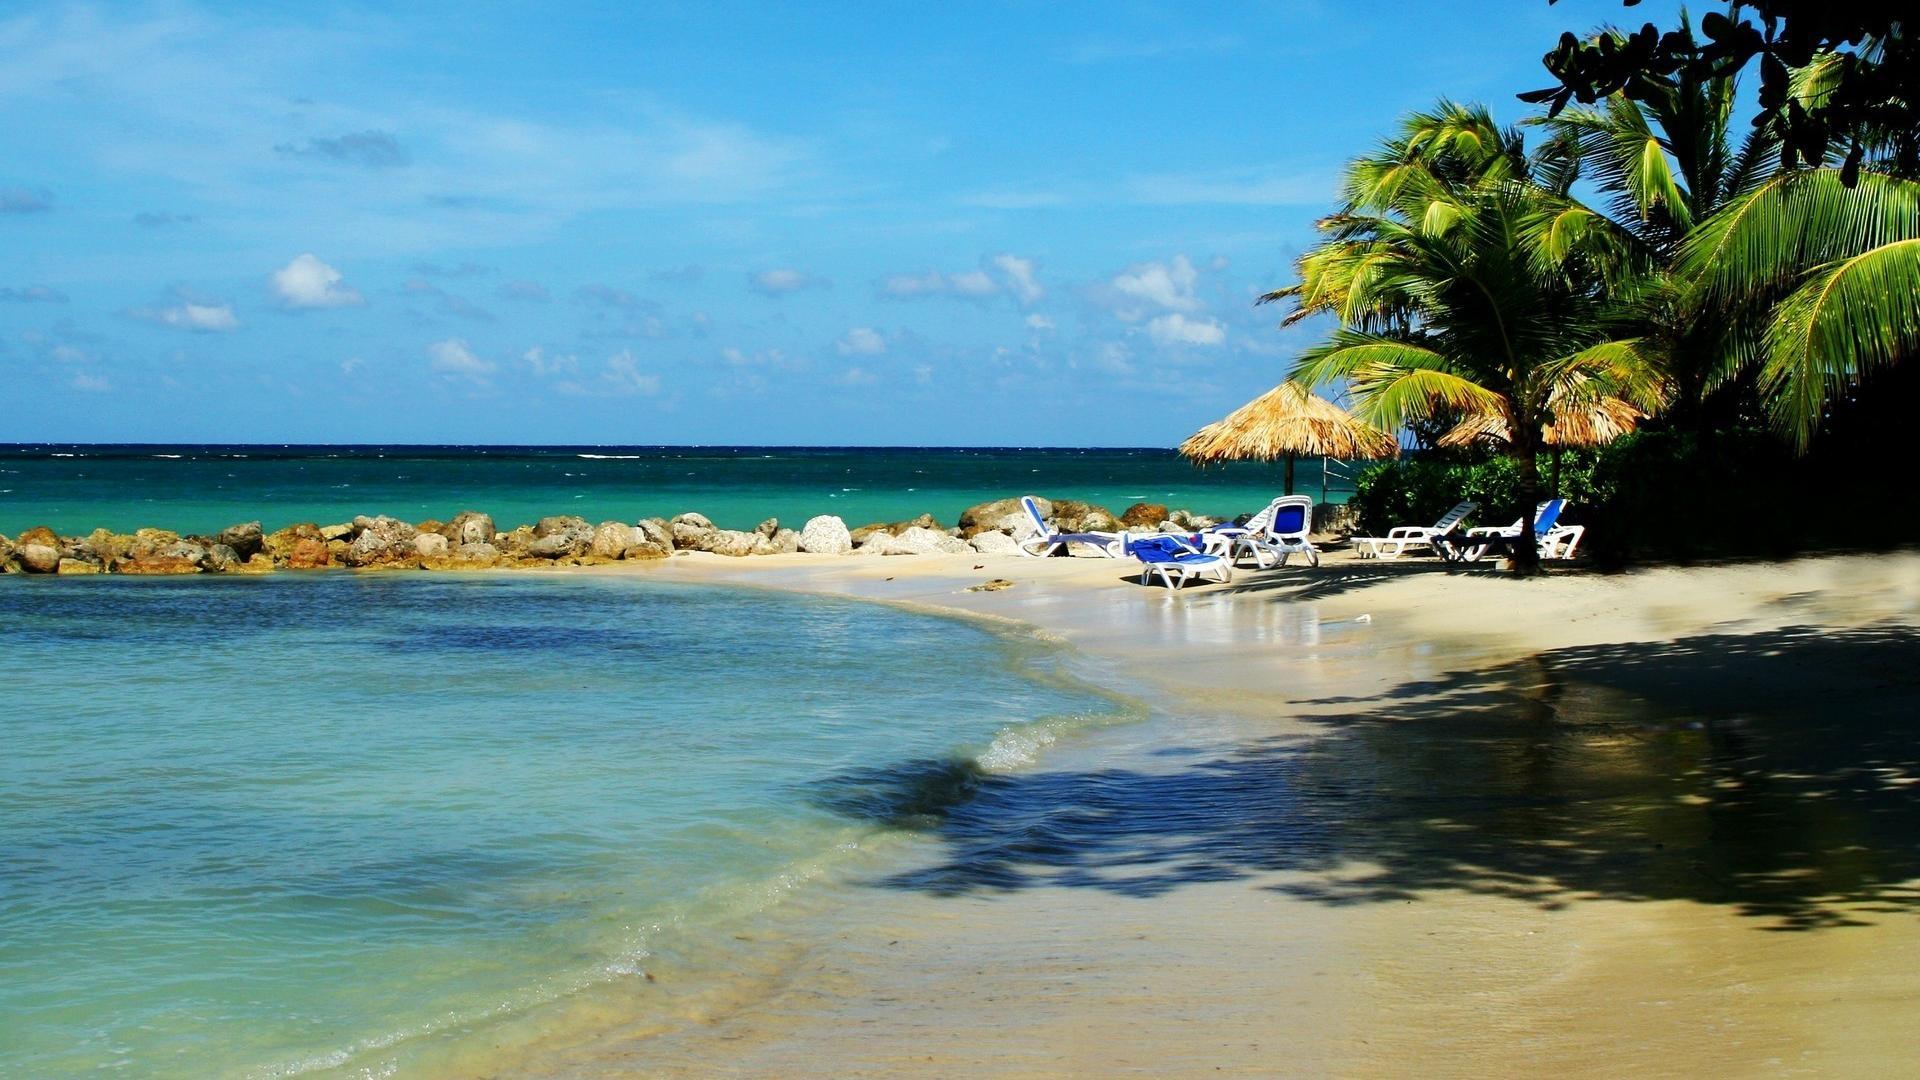 Landscapes beach rocks jamaica chairs palm trees wallpaper 22432 1920x1080